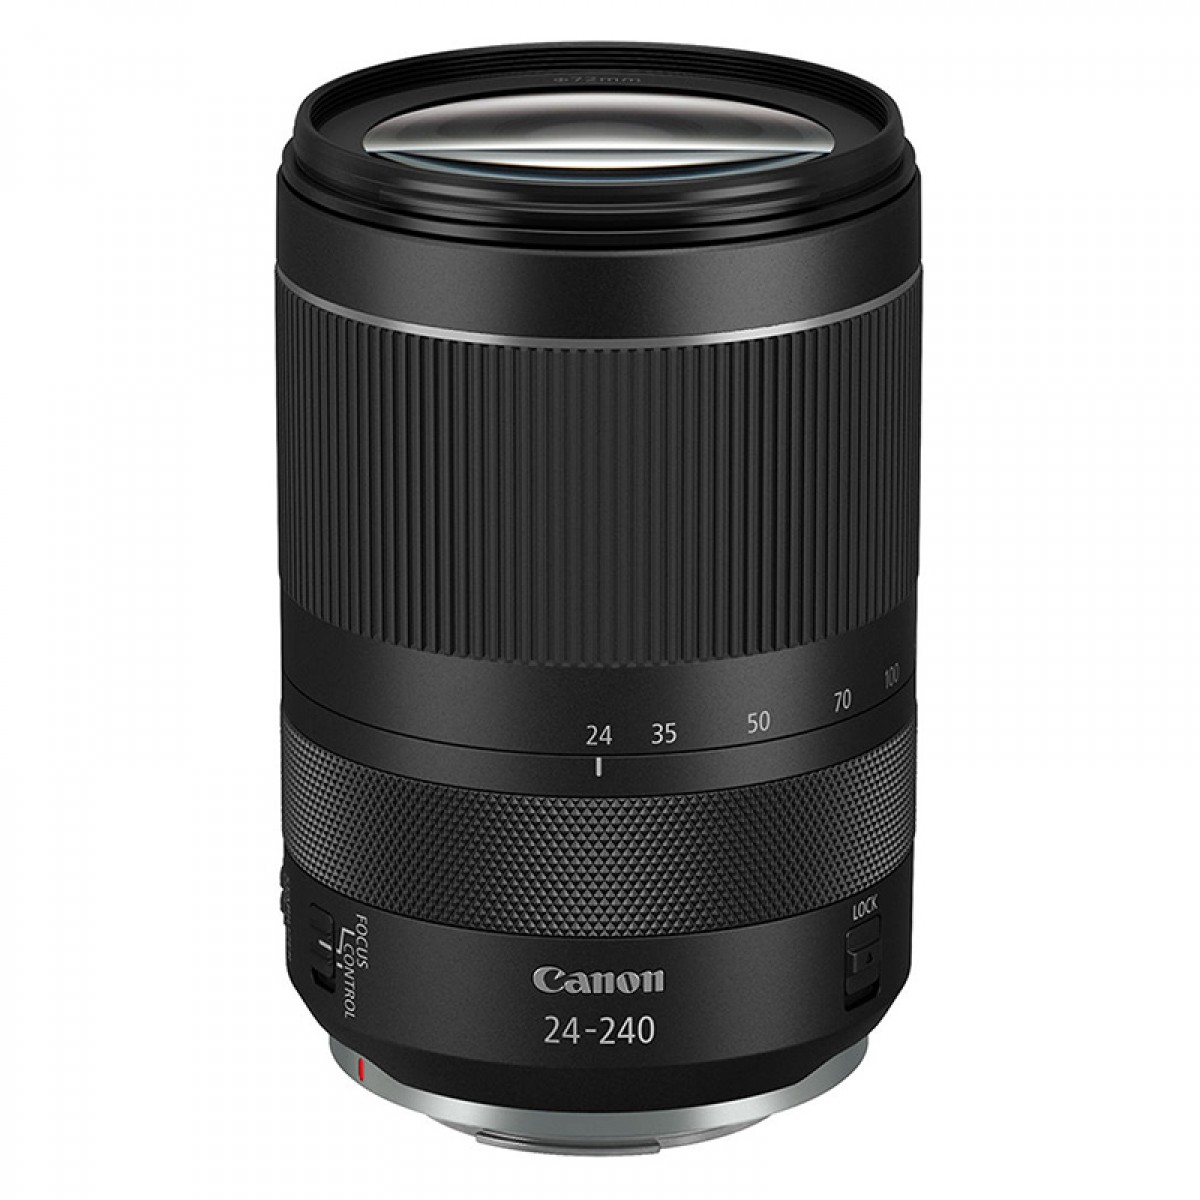 Canon/佳能rf镜头 RF24-240mm F4-6.3 IS USM 全画幅微单变焦镜头